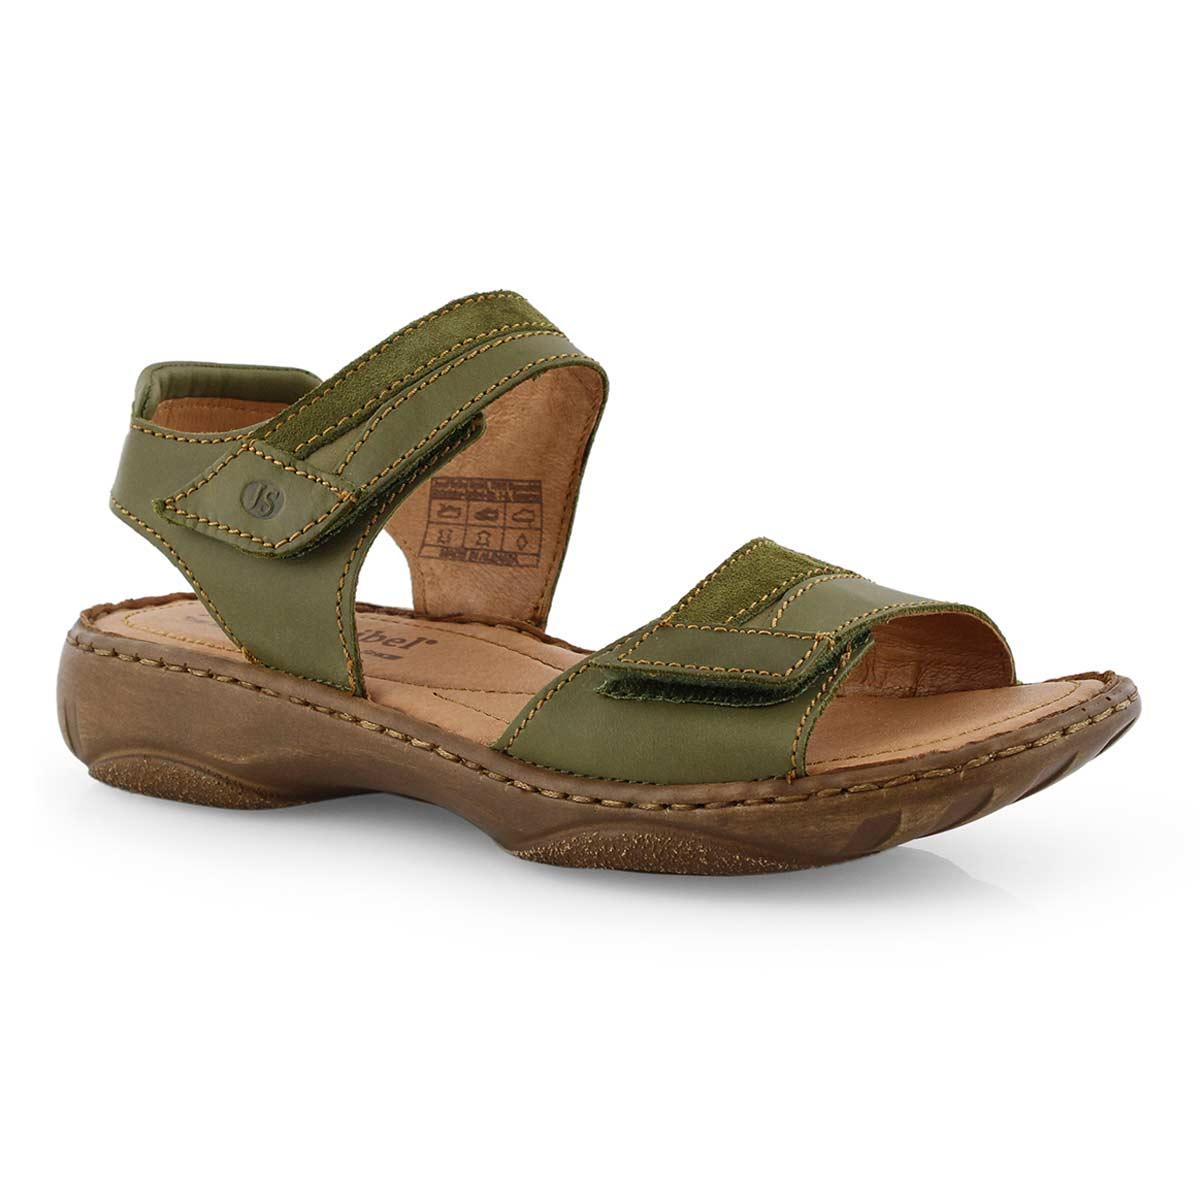 Lds Debra 19 olive casual 2 strap sandal